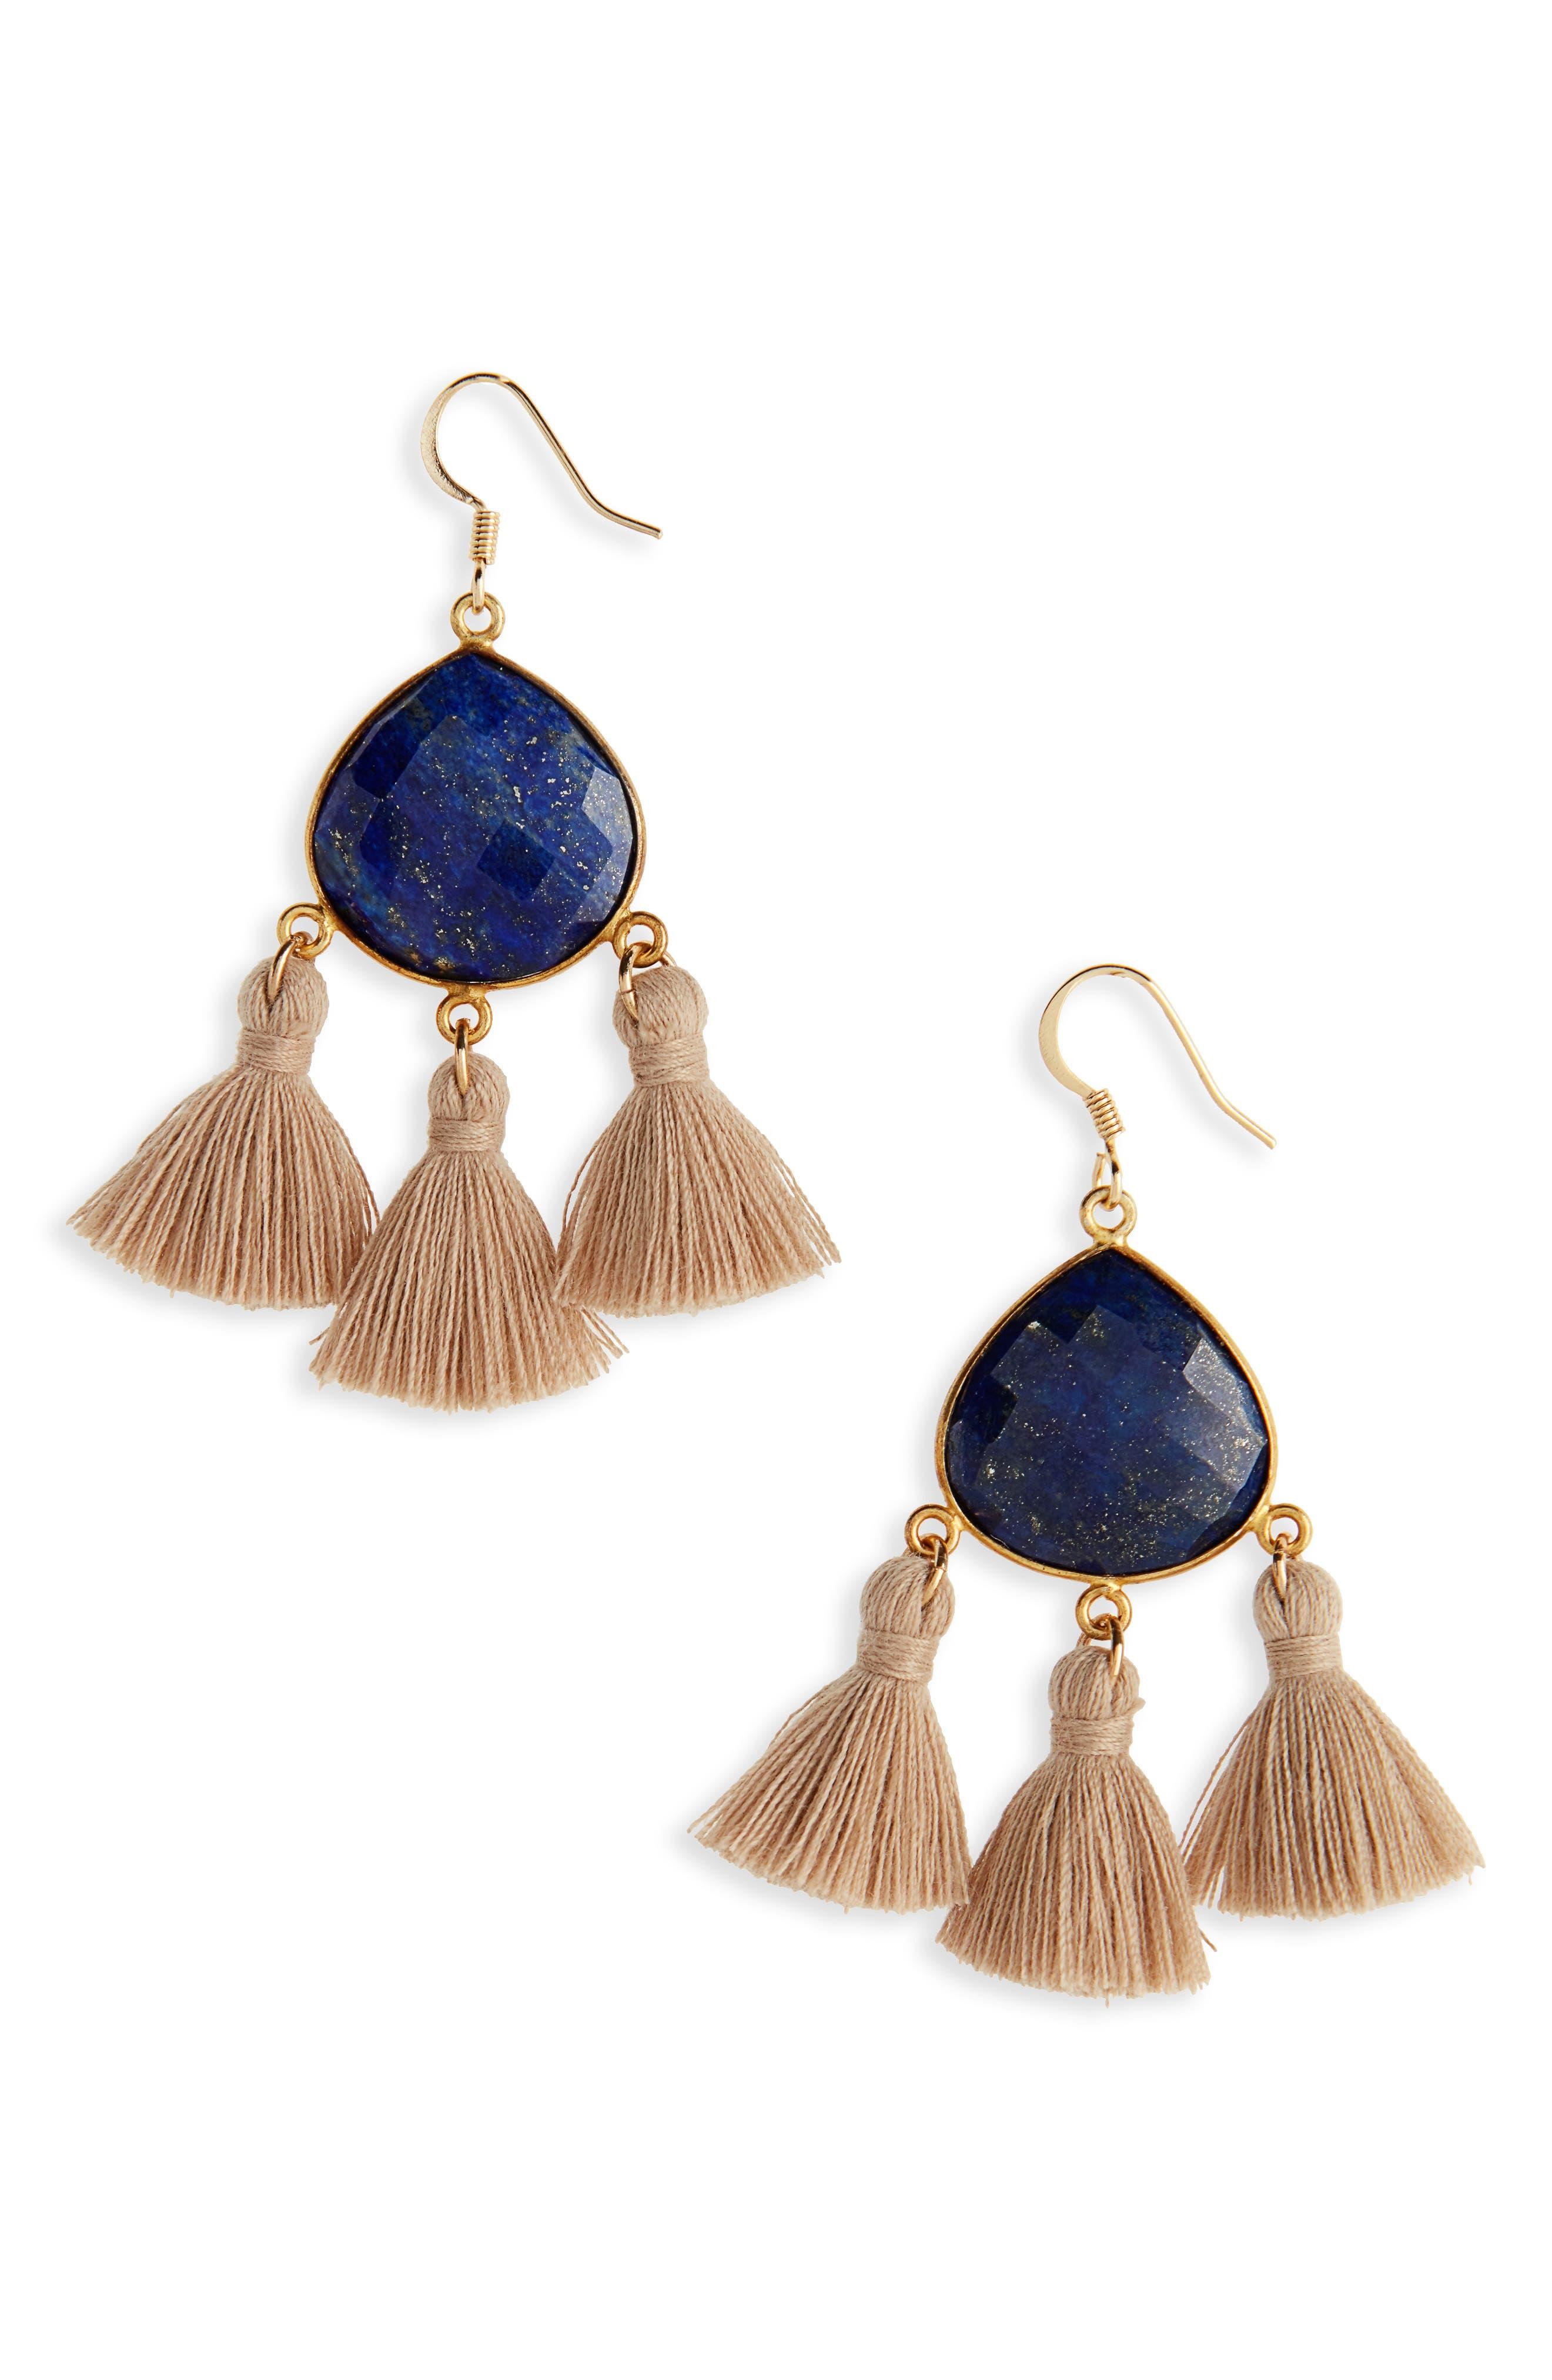 Main Image - Love's Affect Lacey Semiprecious Tassel Drop Earrings